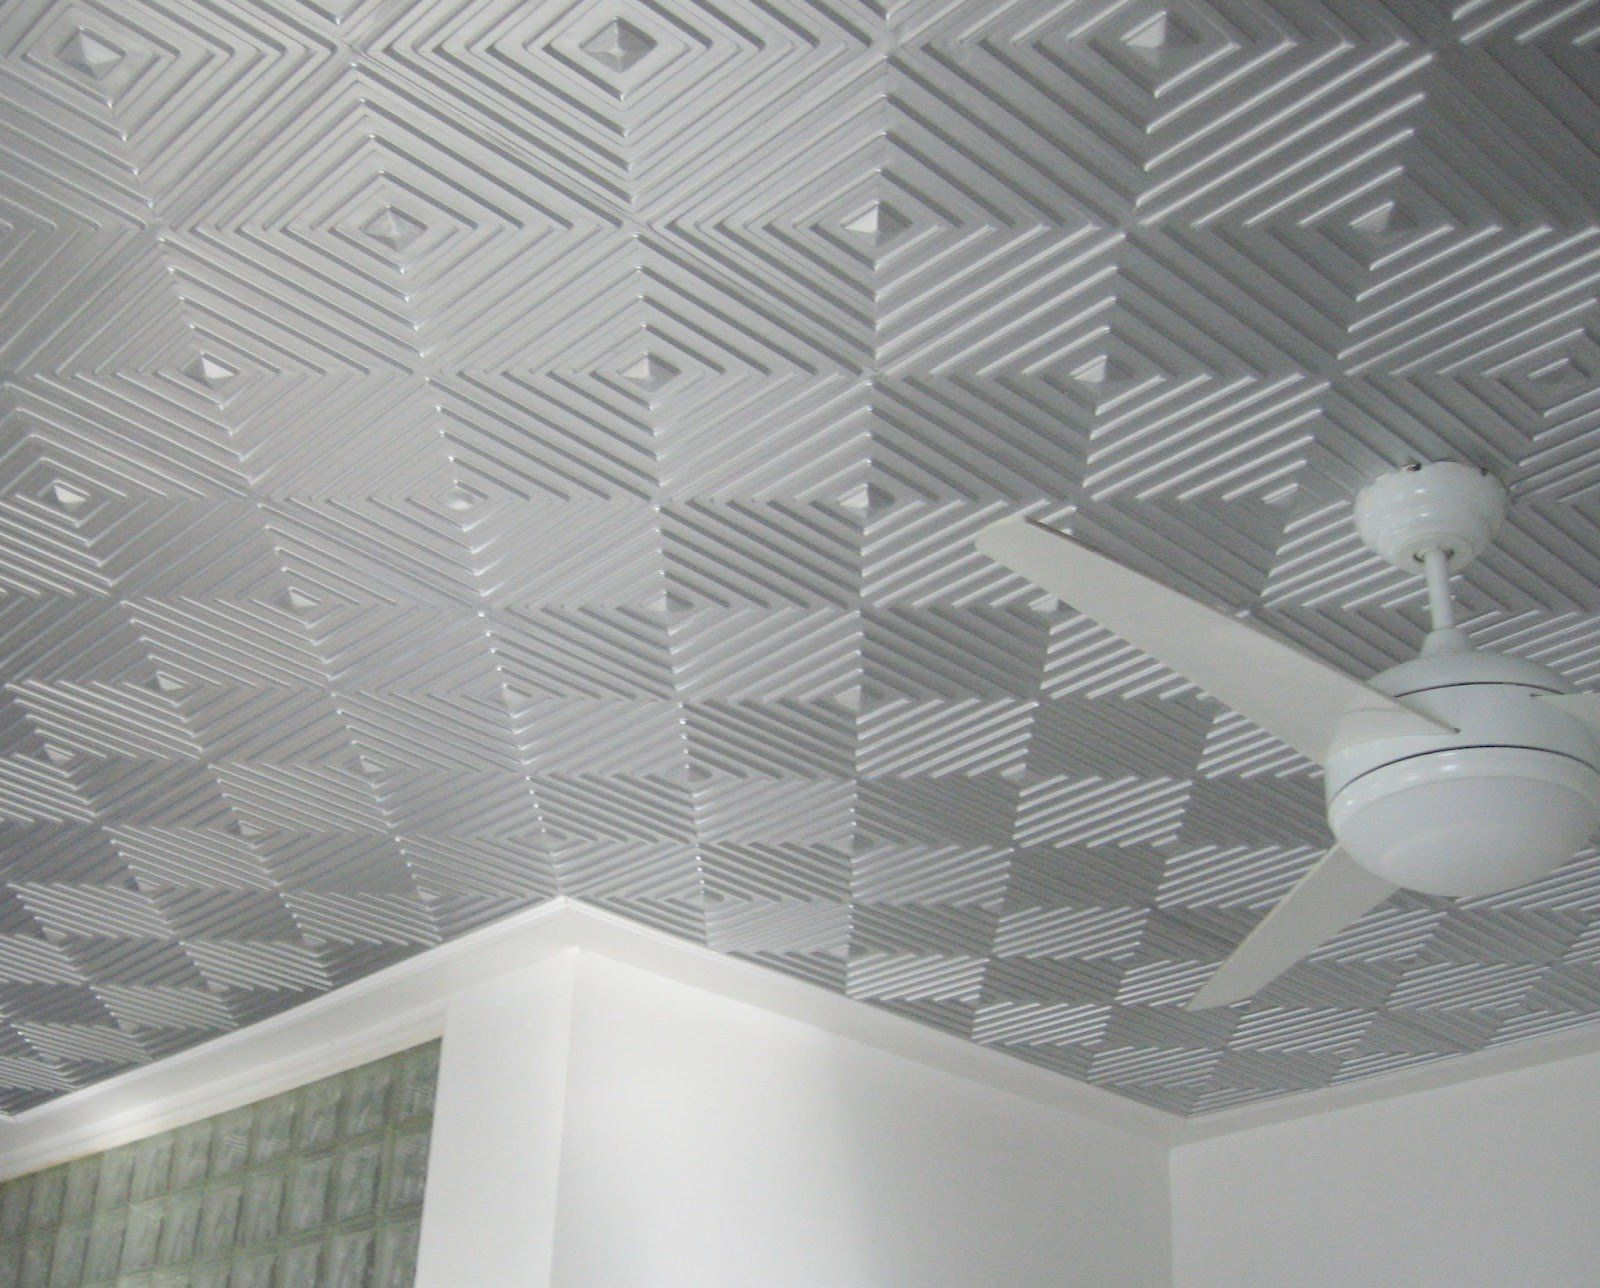 Image Result For Modern Drop Ceiling Tiles With Images Ceiling Tiles Plastic Ceiling Tiles Metal Ceiling Tiles